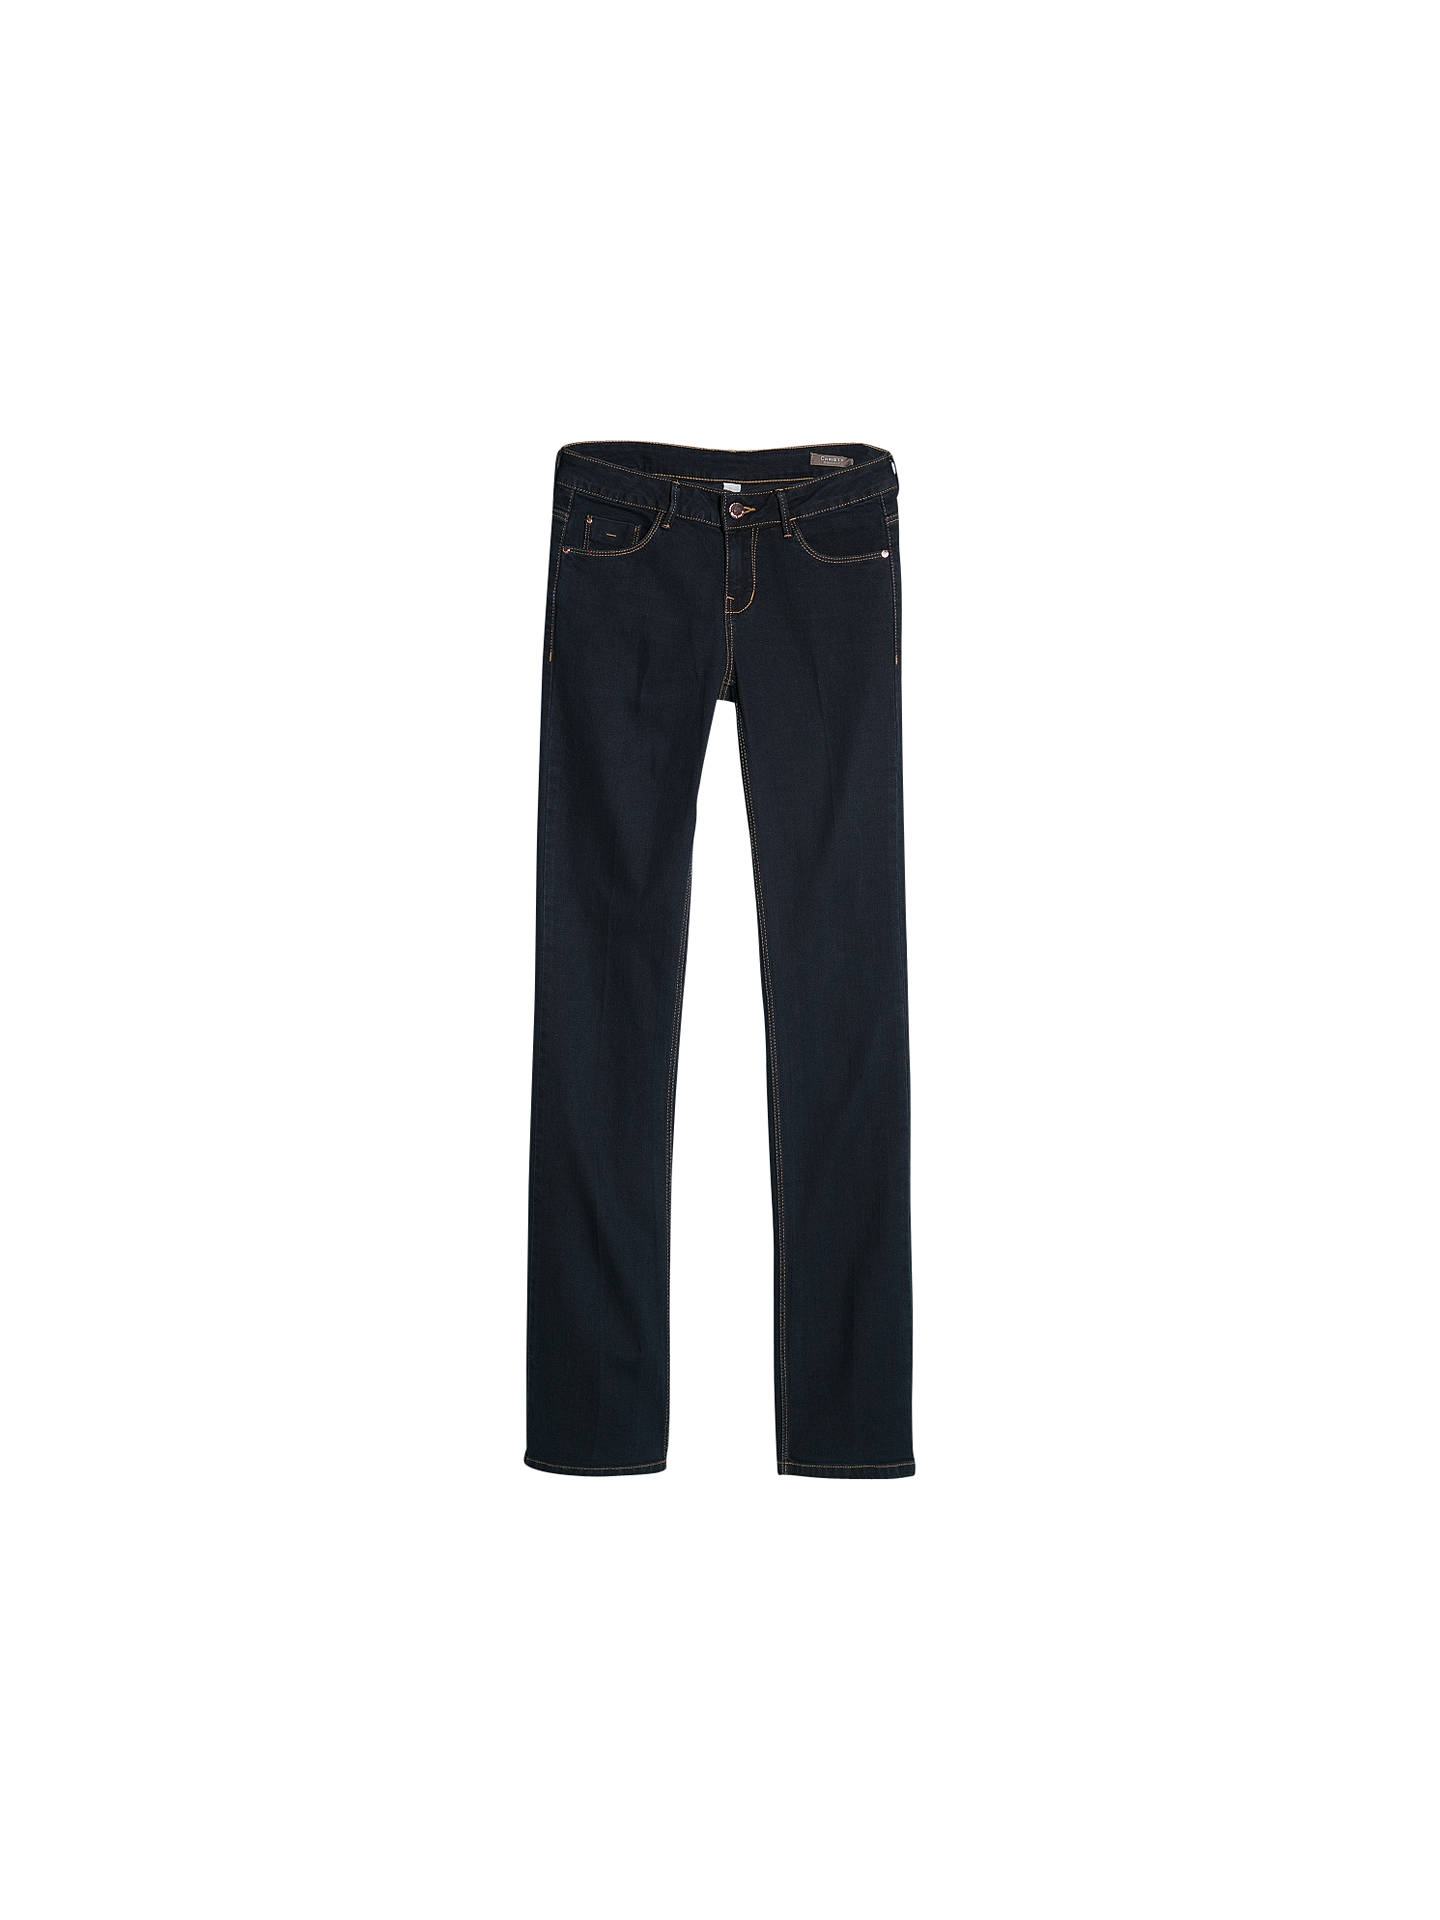 b39eea9f9c BuyMango Bootcut Christy Jeans